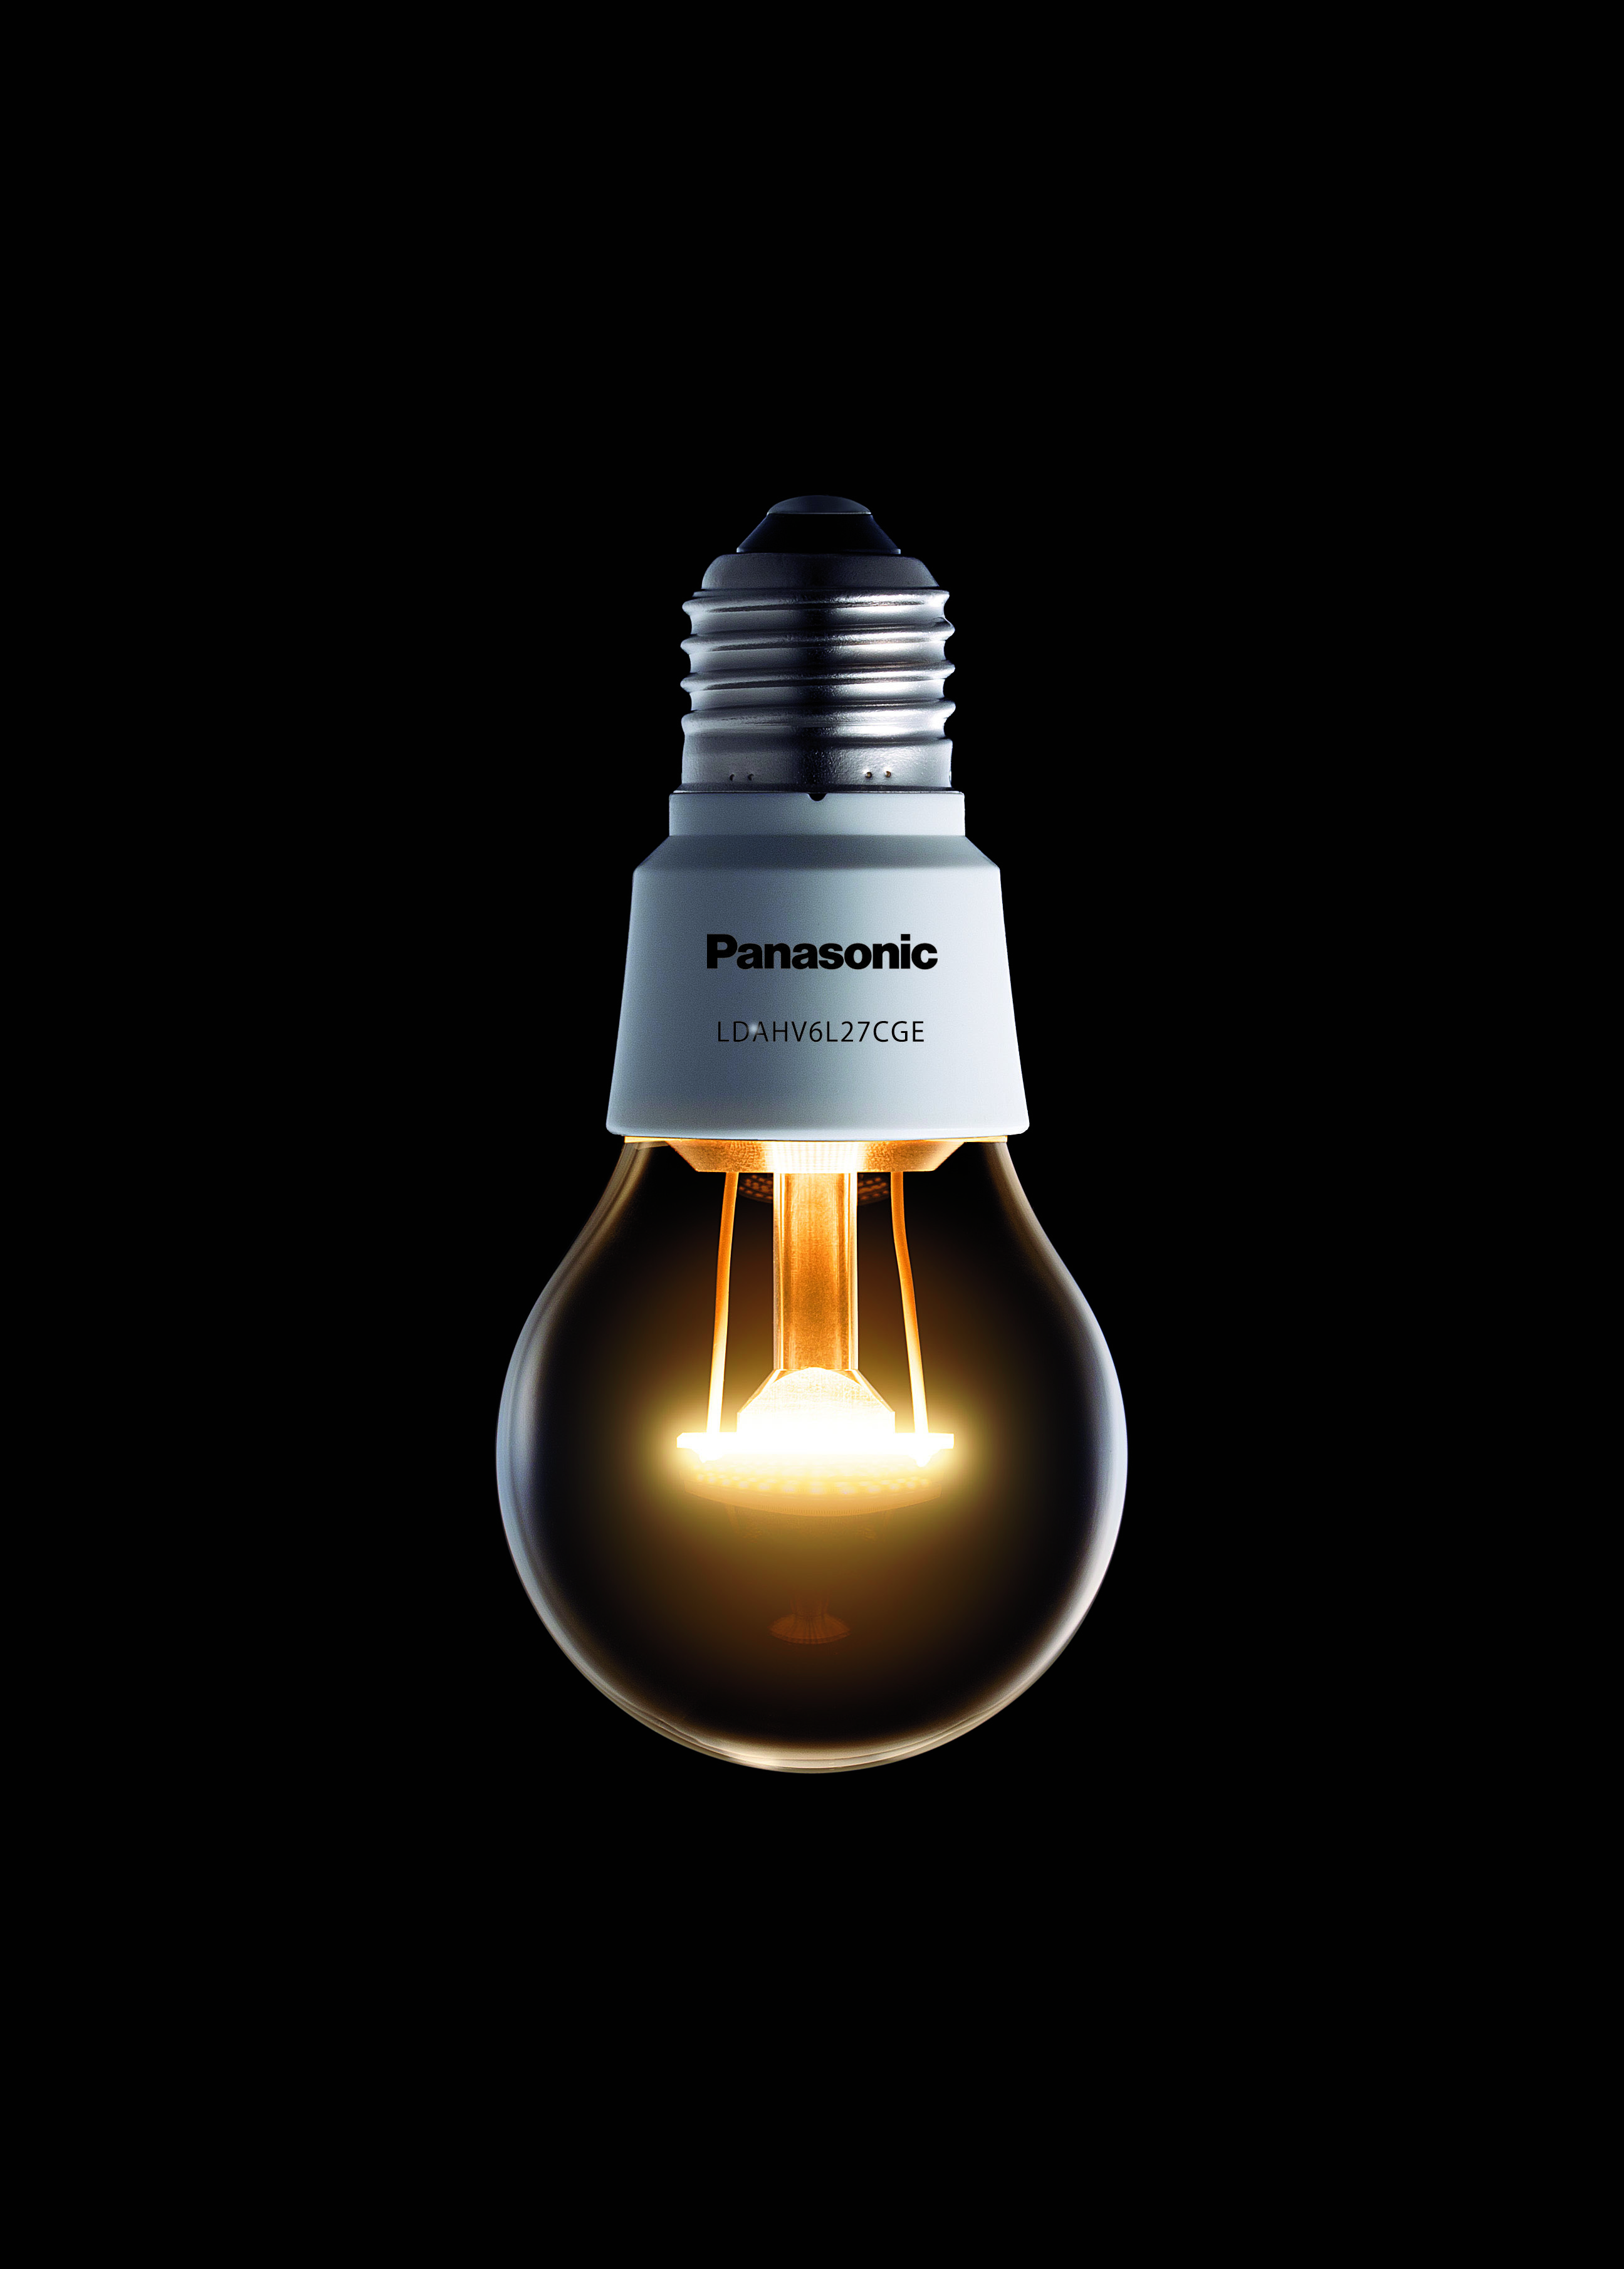 Modelli di lampadine a led cheminfaisant for Lampadine led costo